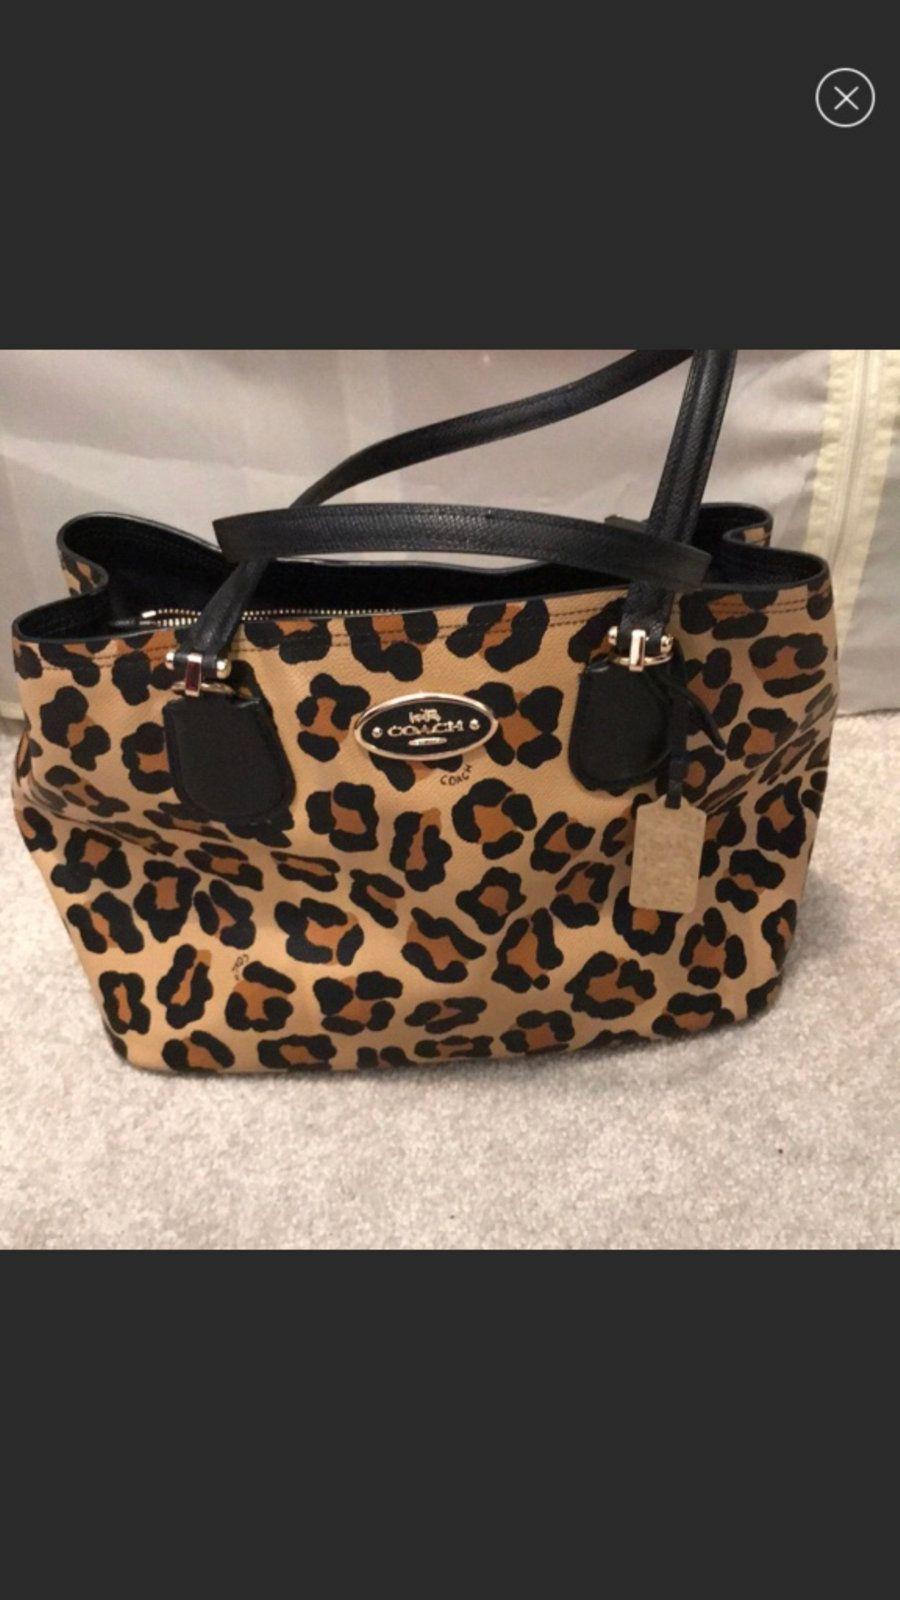 beige and black leopard Coach tote bag in Columbia letgo